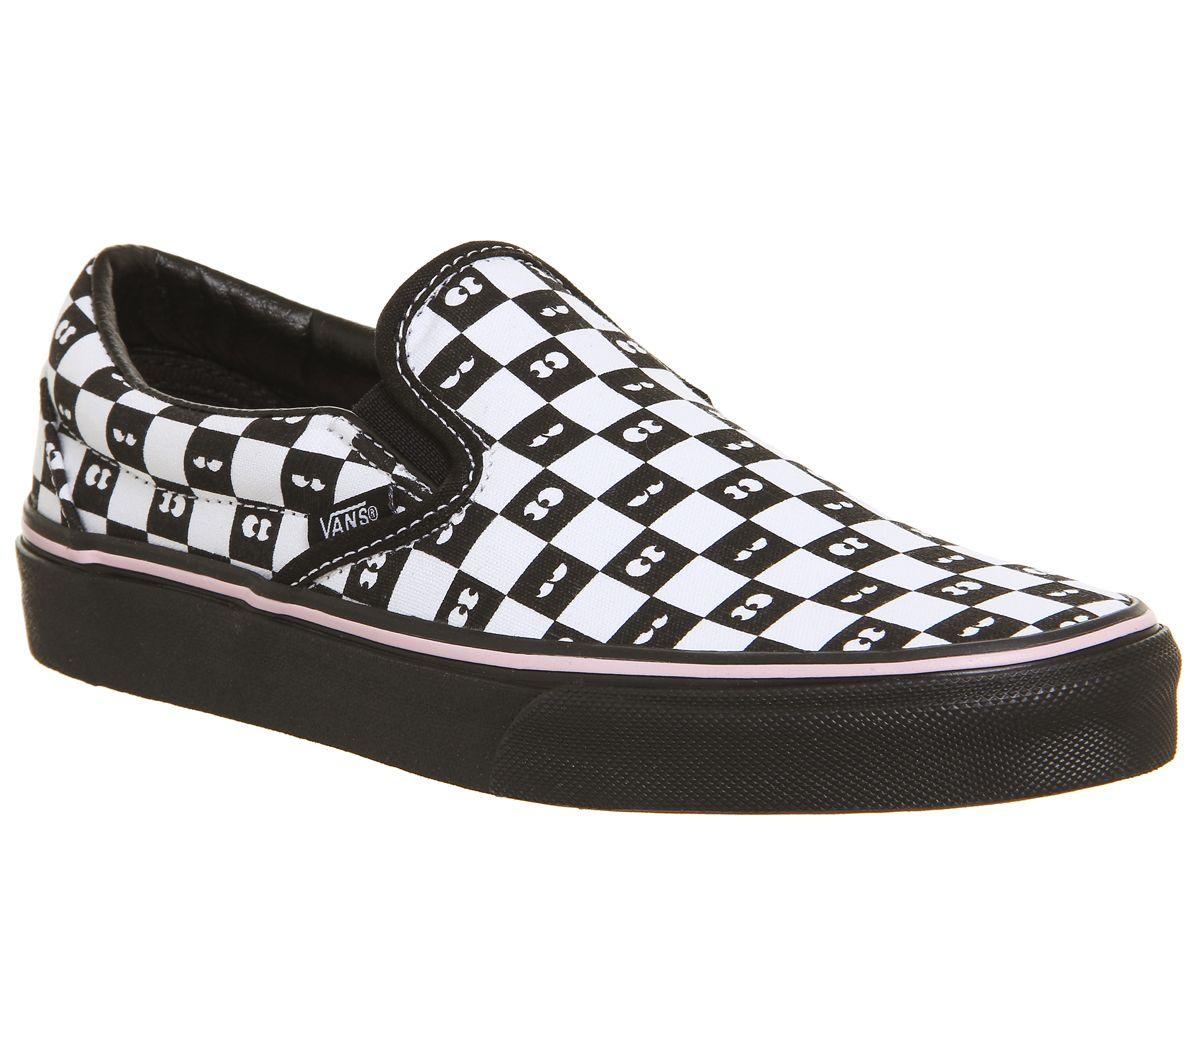 d4cef1f816 Vans Vans Classic Slip On Trainers Lazy Oaf Eyeballs Checkerboard ...